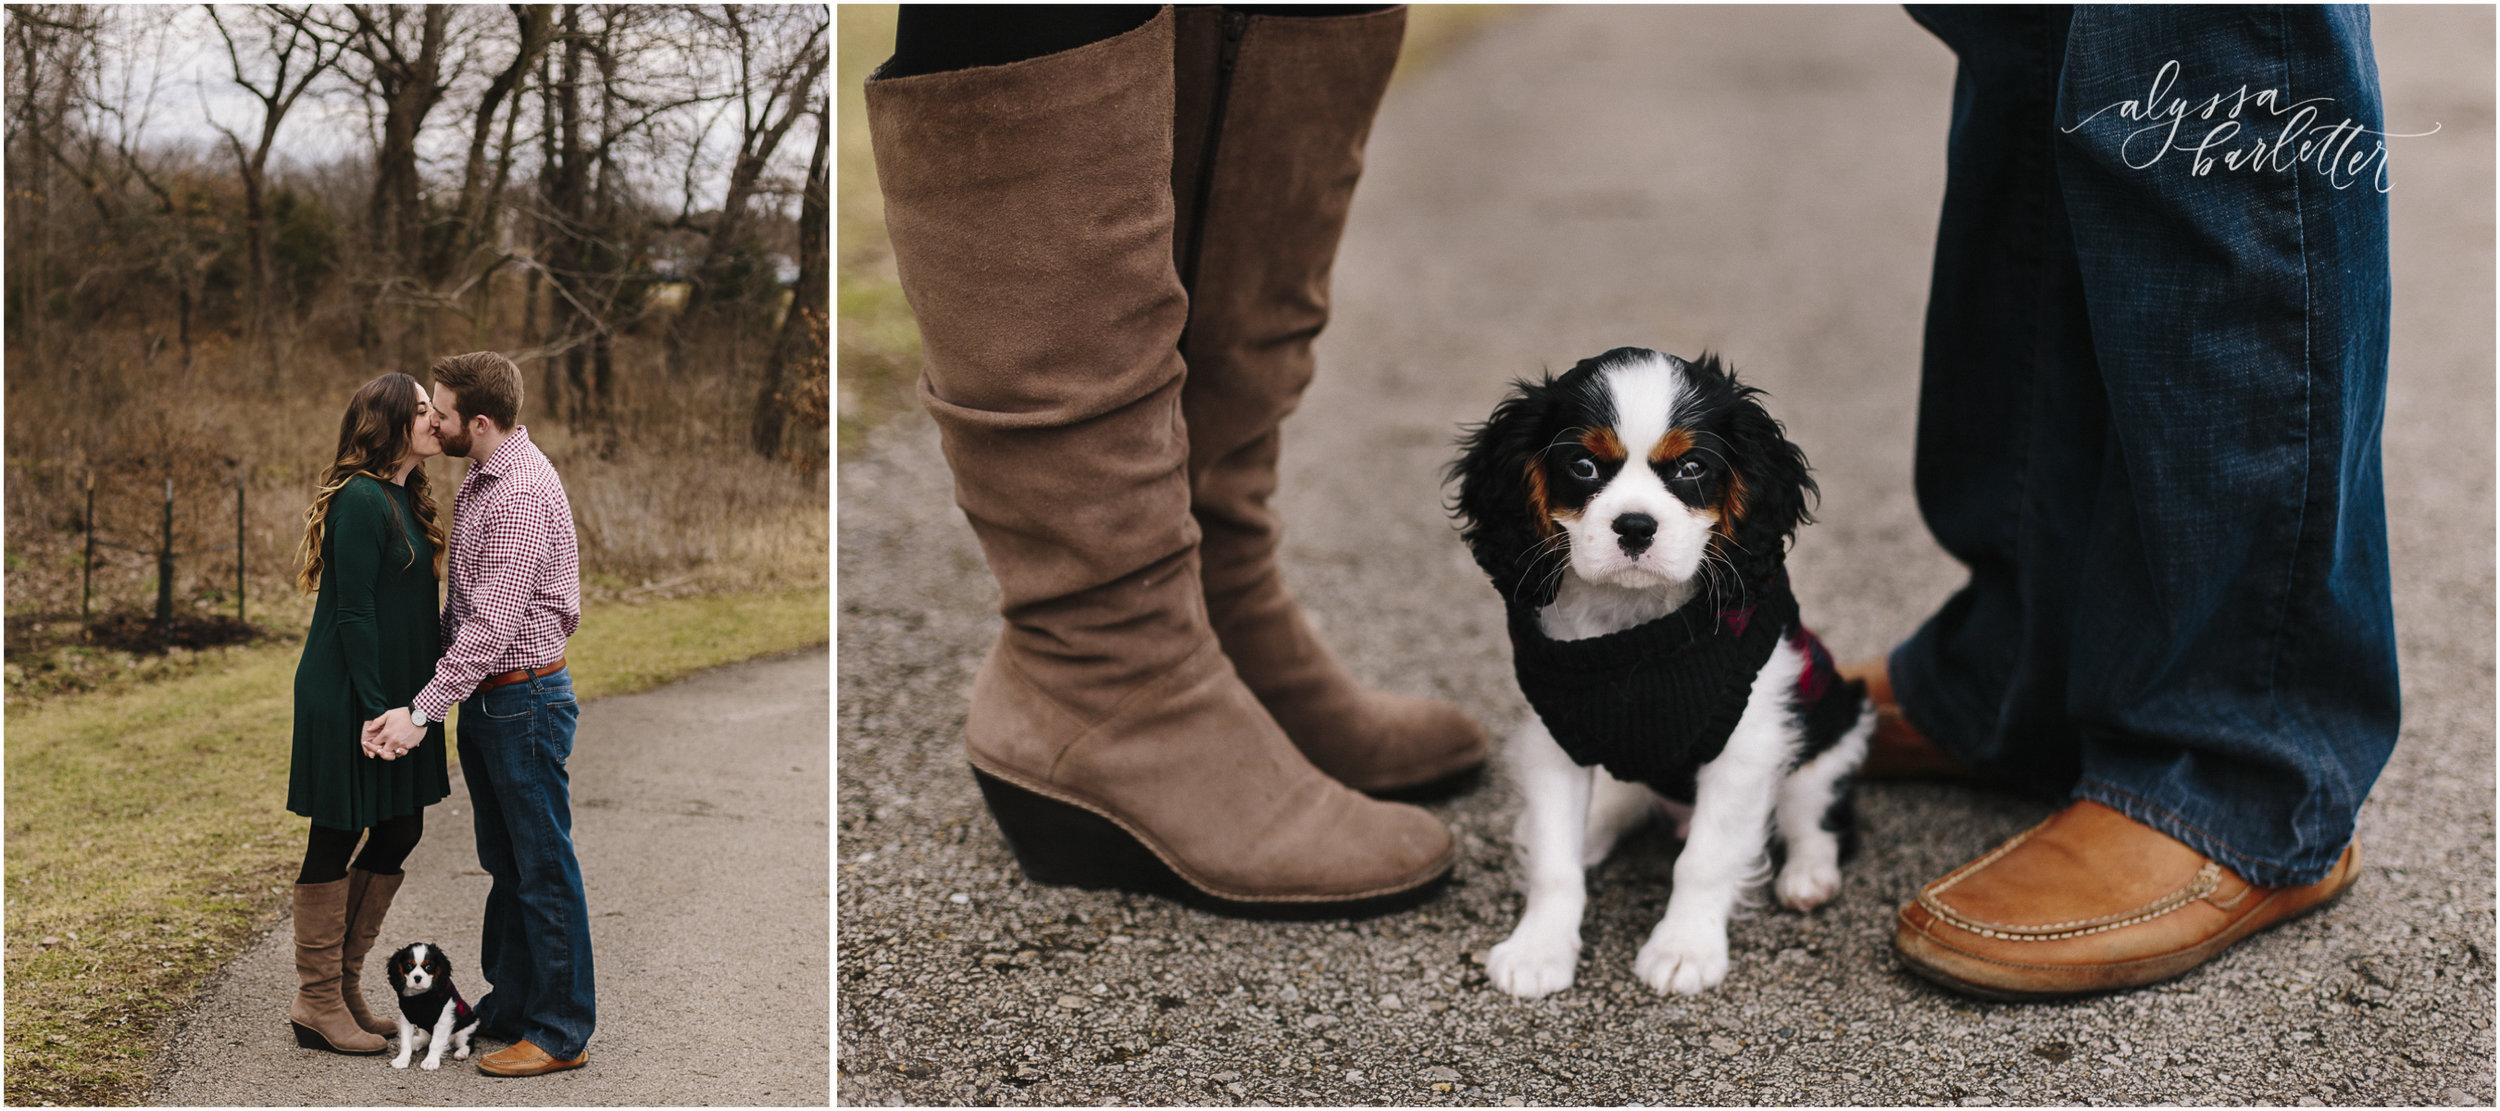 alyssa barletter photography lifestyle apartment new puppy-1-9.jpg